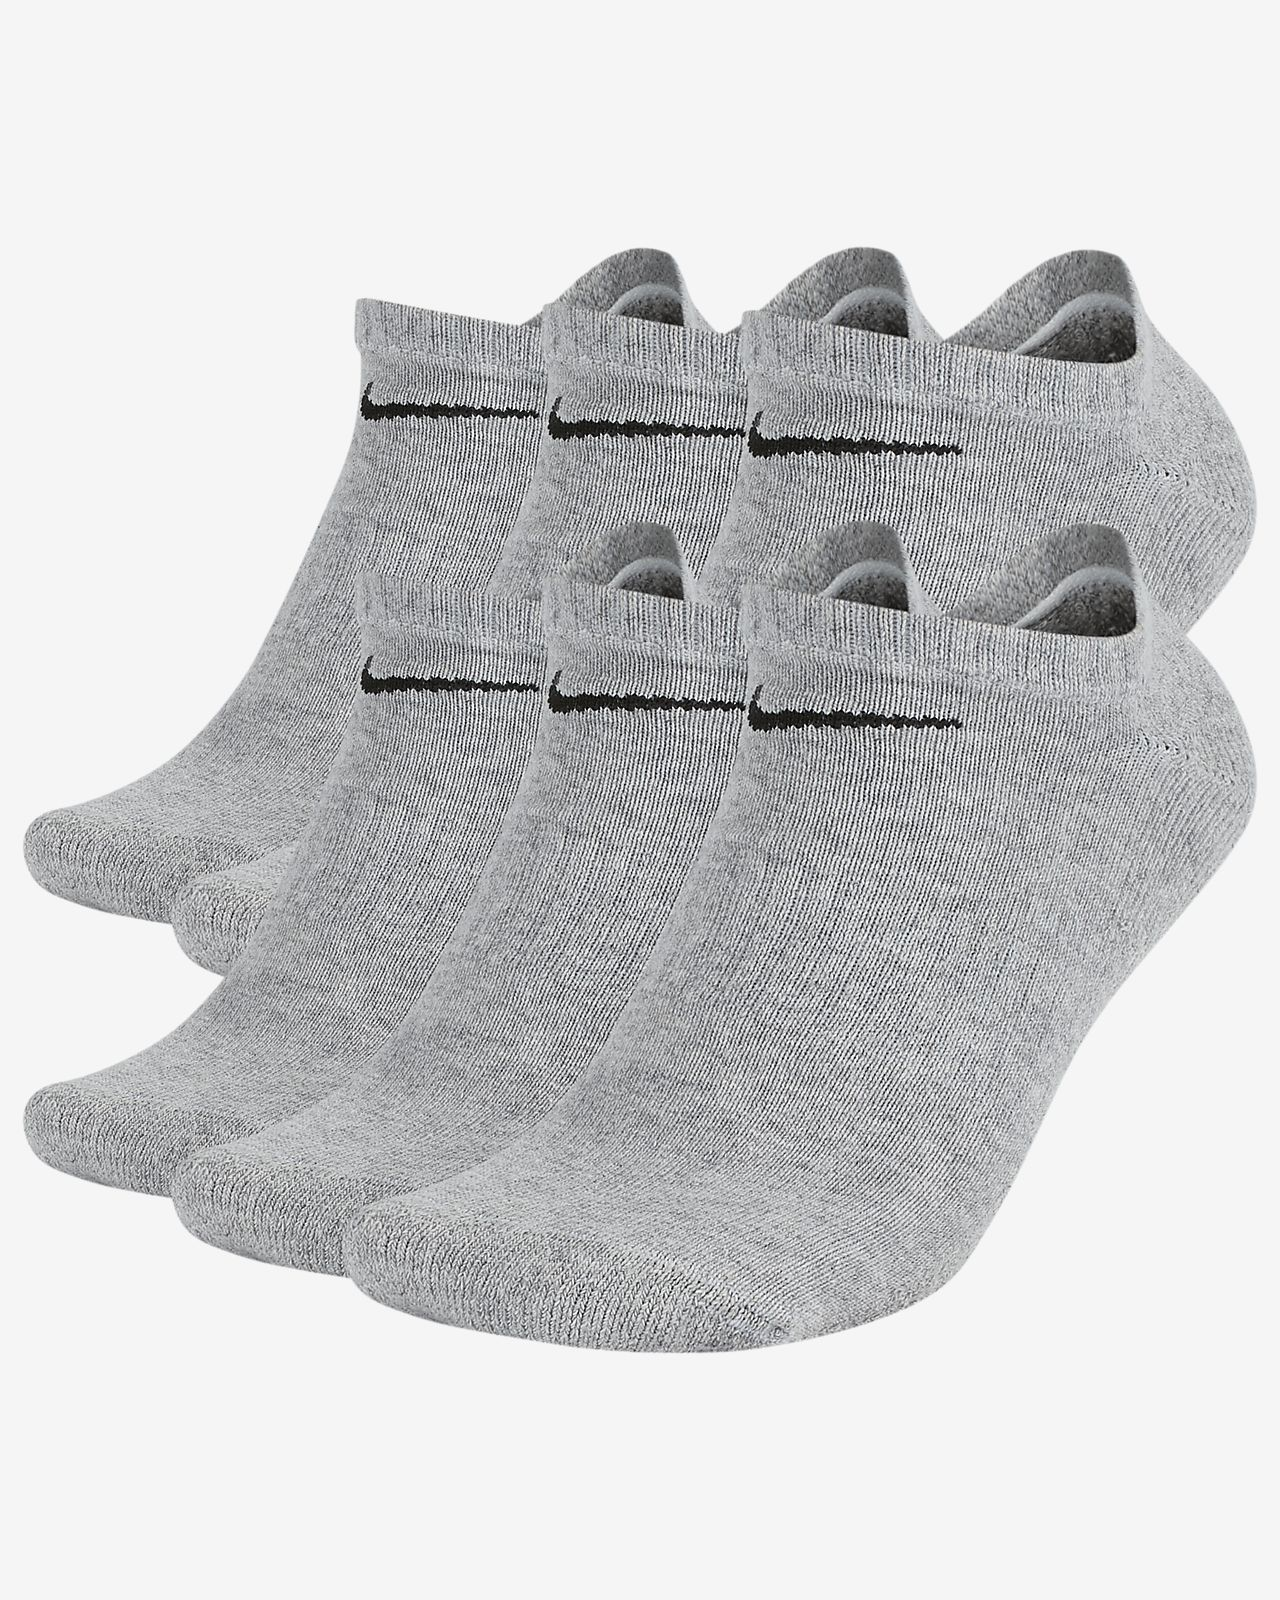 Nike Everyday Cushioned Training No-Show Socks (6 Pairs)